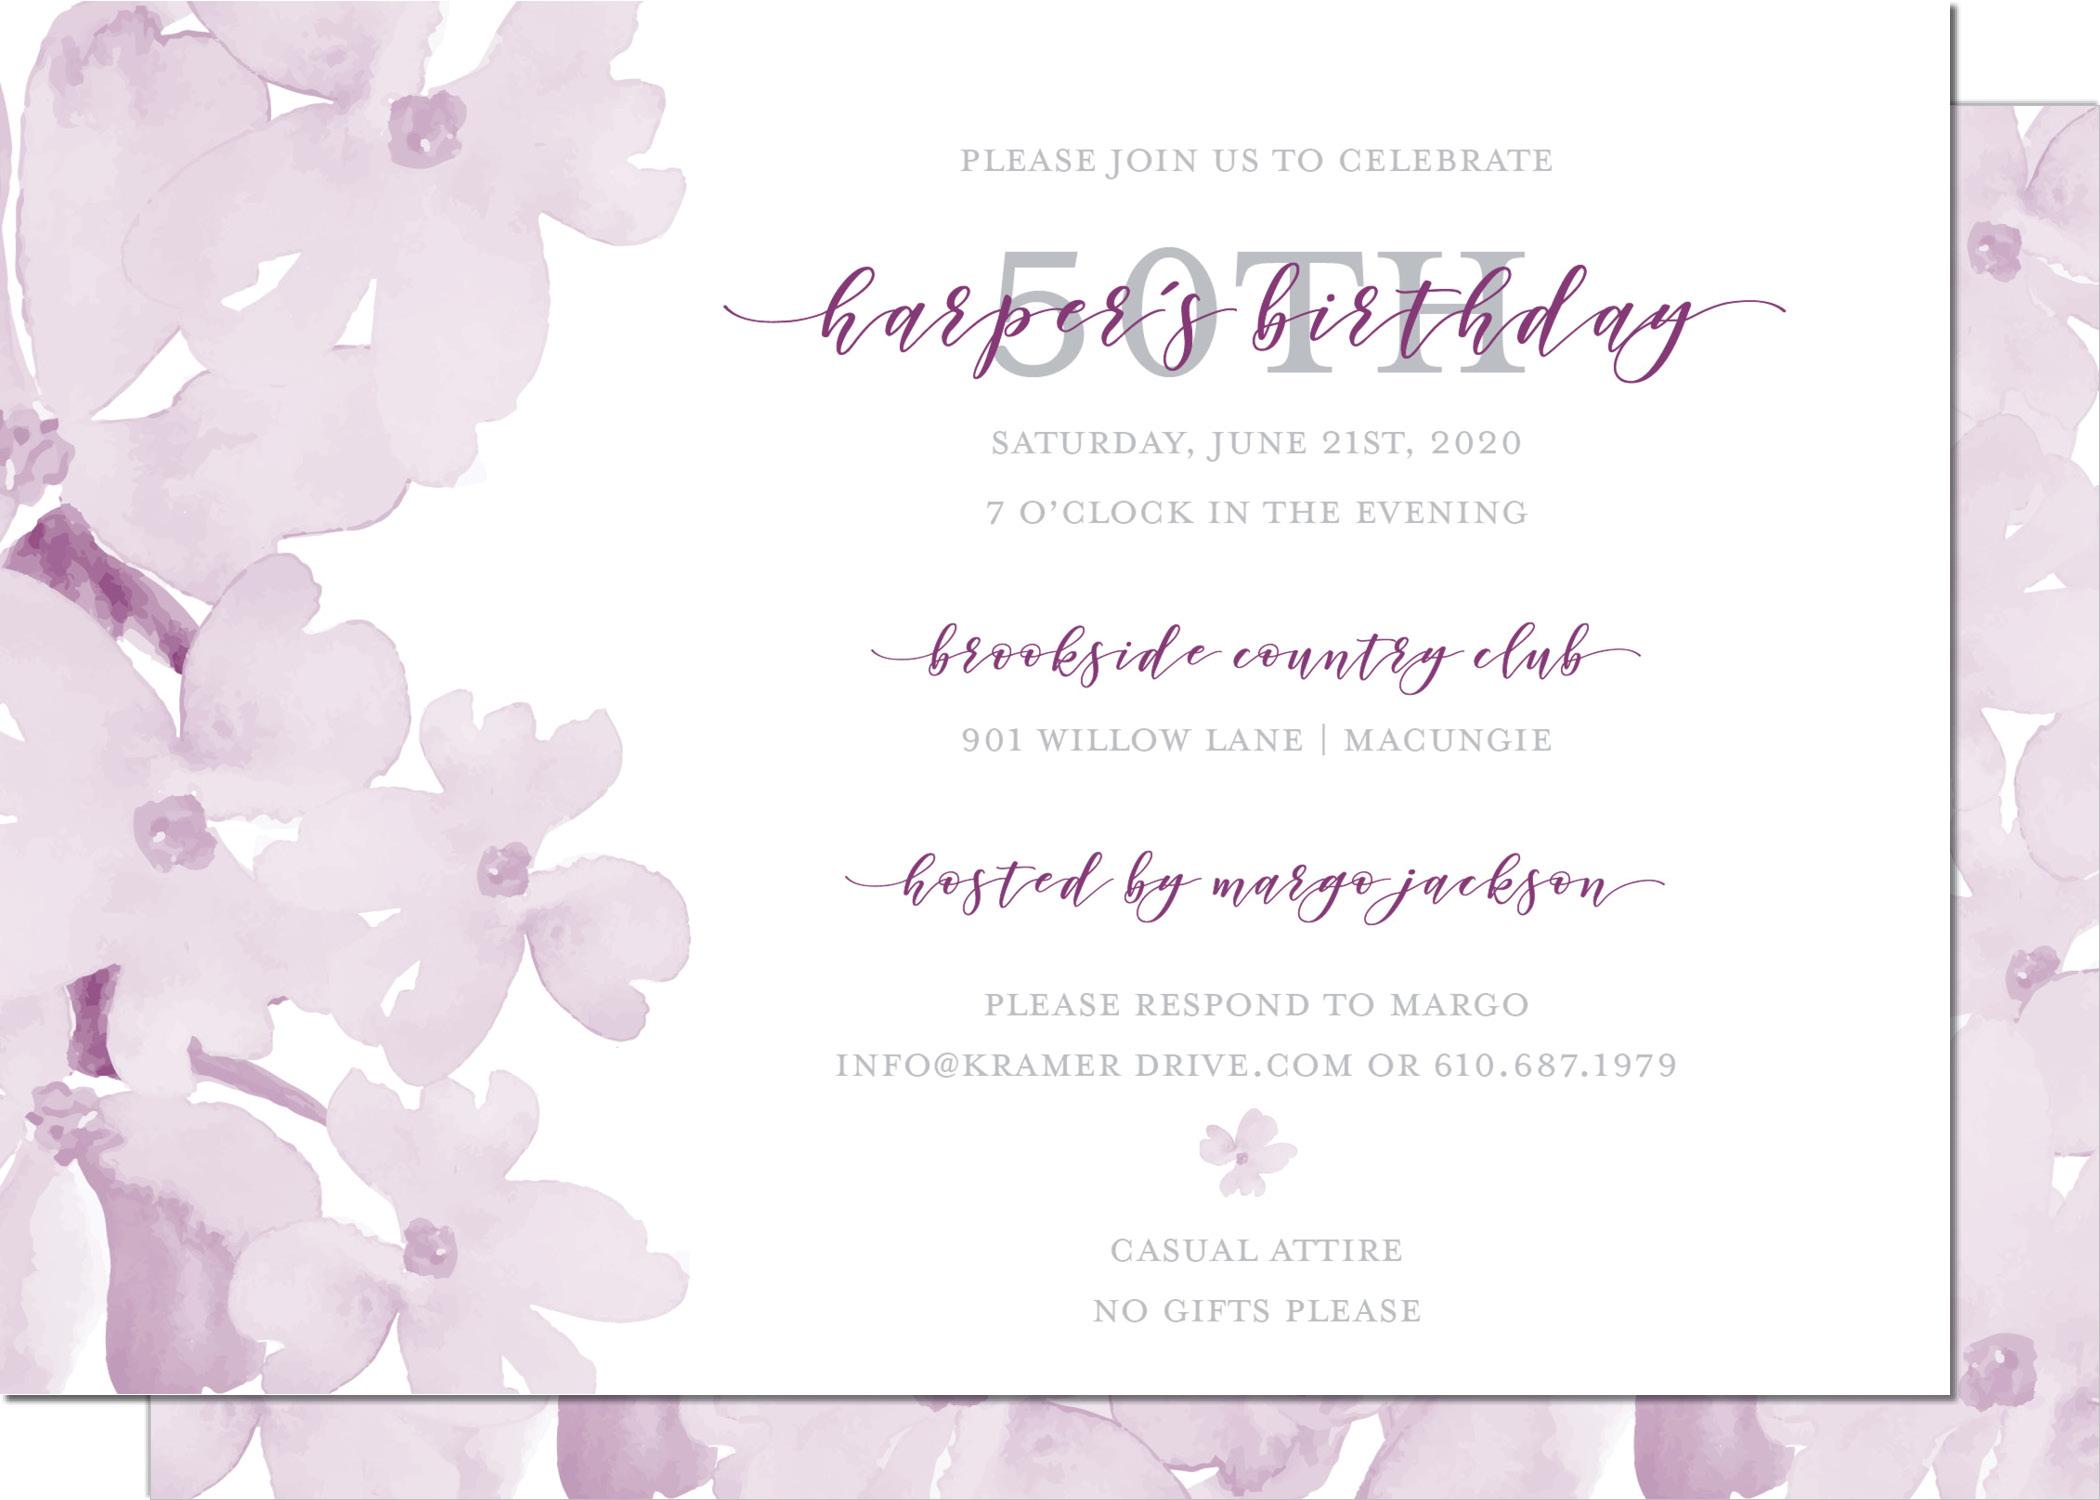 KD3155IN-PB Budding Birthday